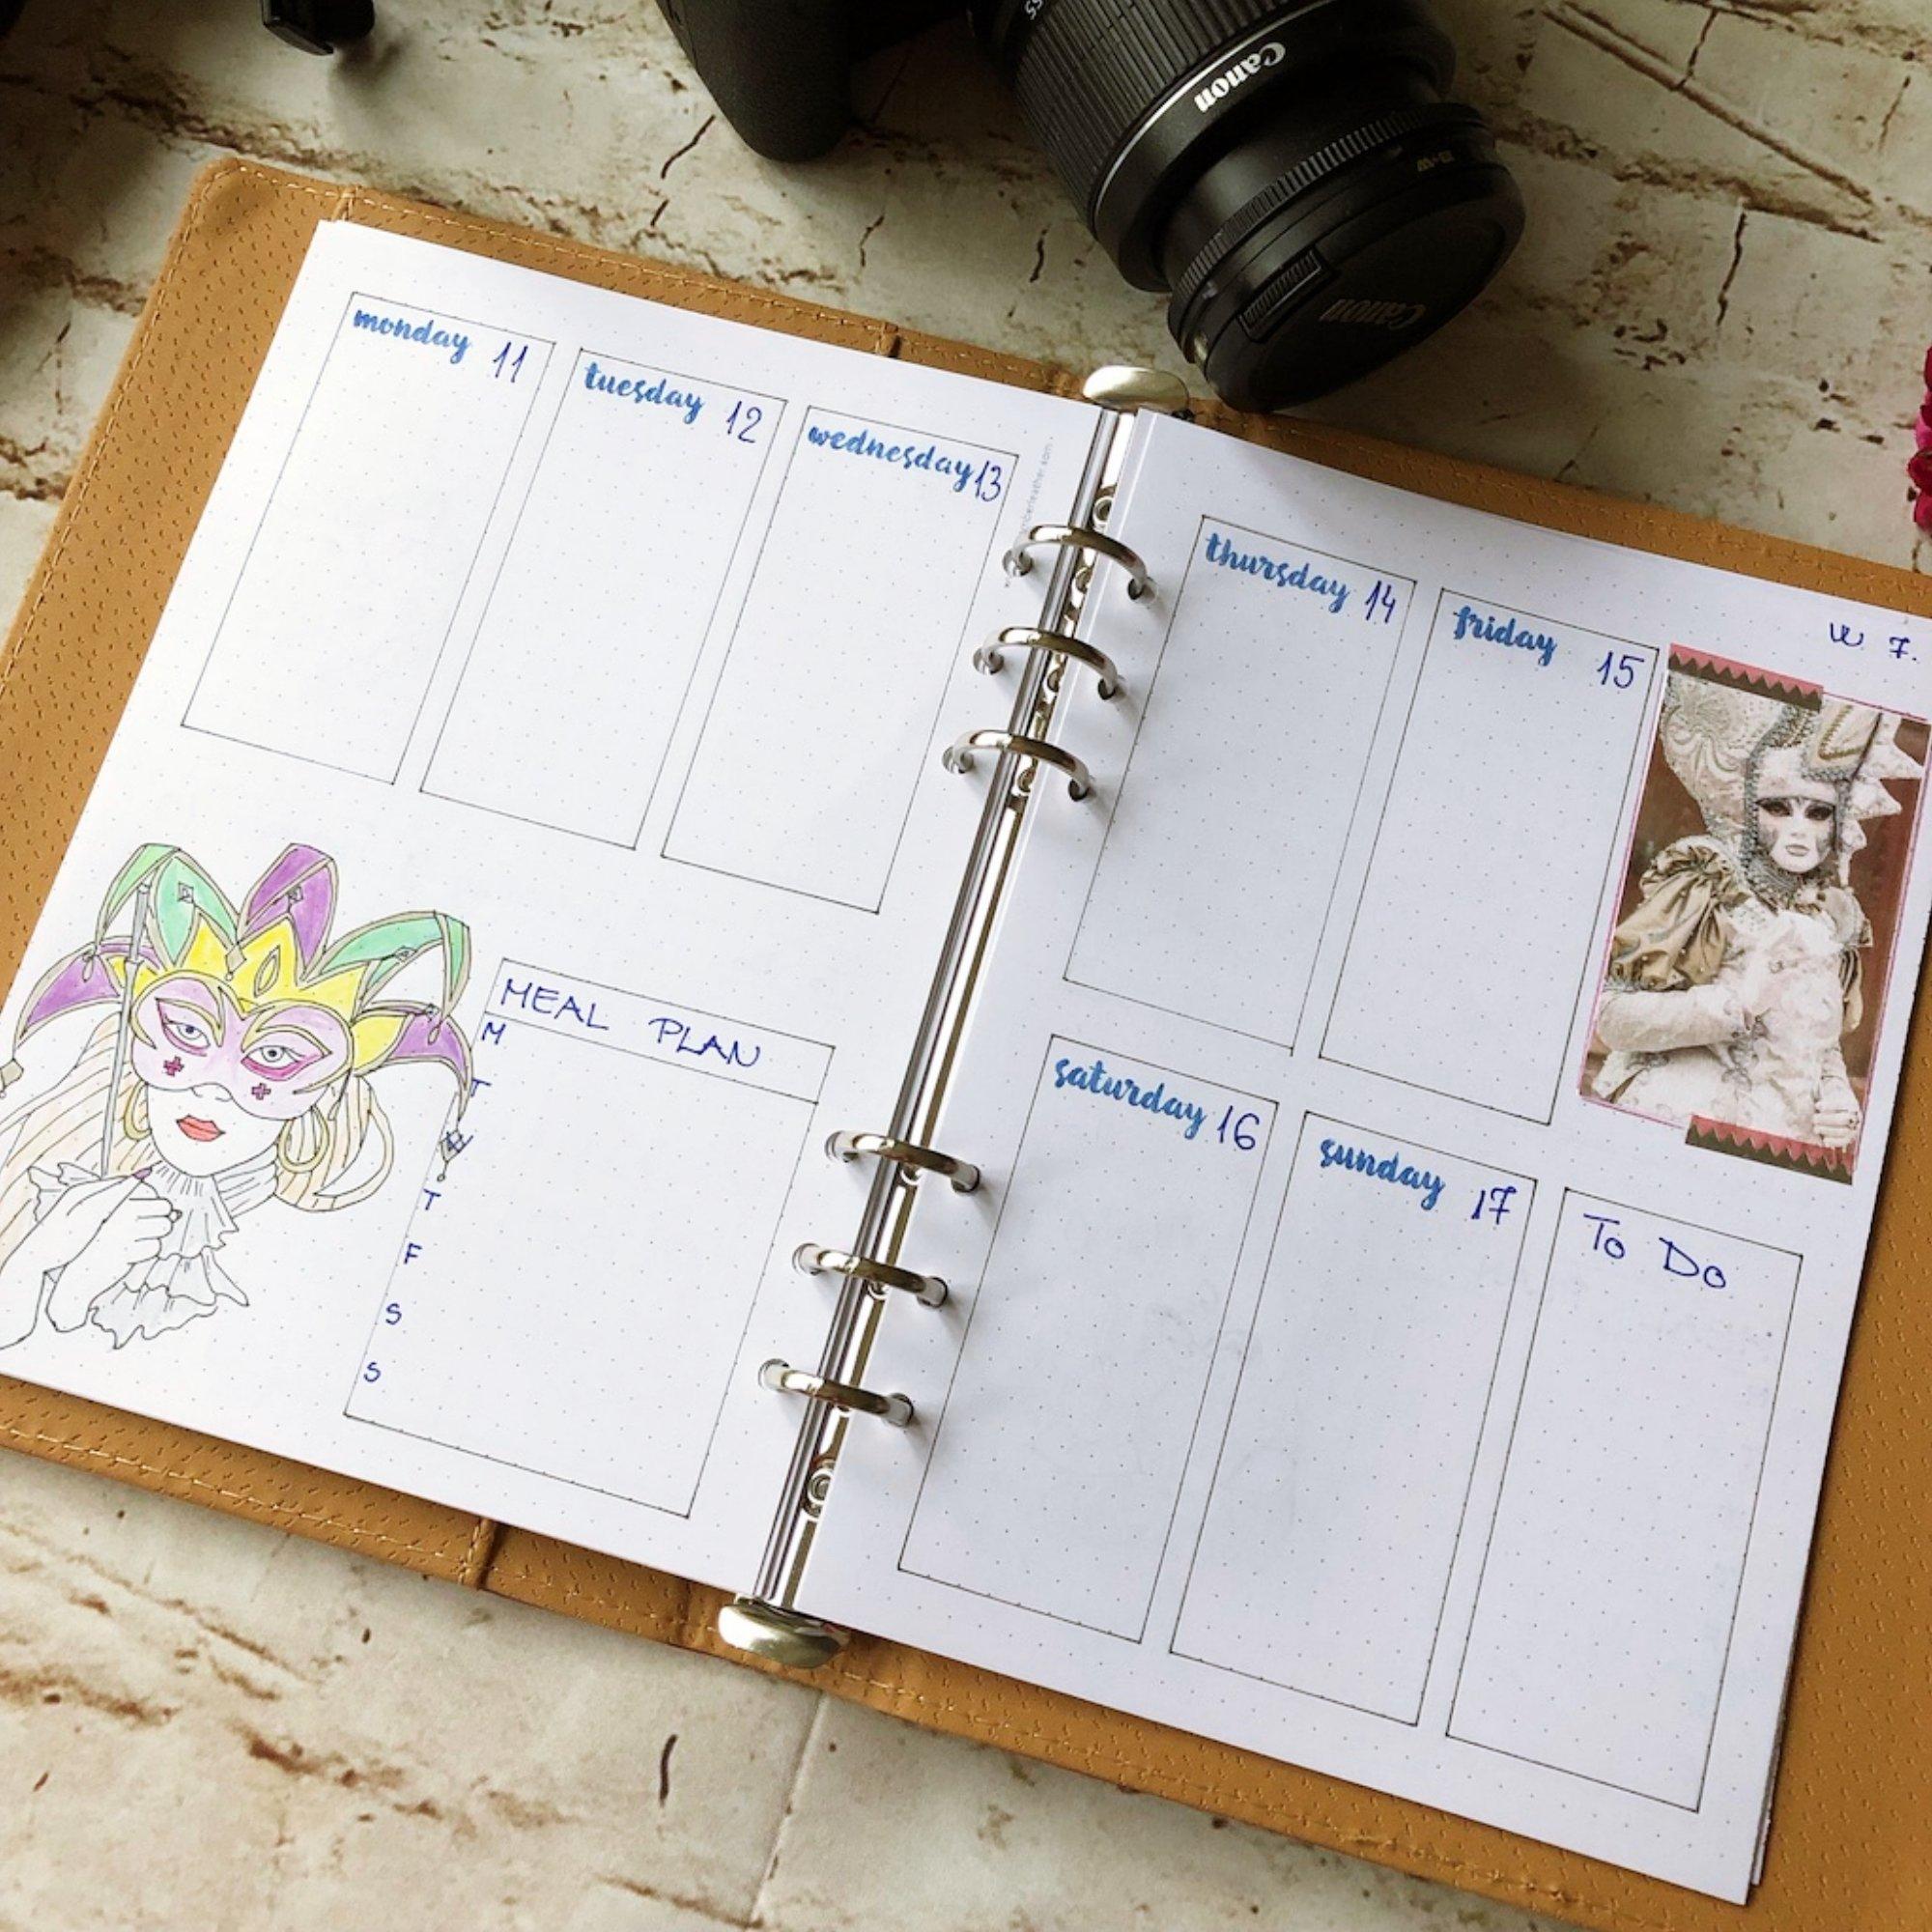 Creative journaling weekly planner - week 7 - itstartswithacoffee.com #creativejournaling #bulletjournaling #planner #weeklyplanner #weekly #February #2019 #week7